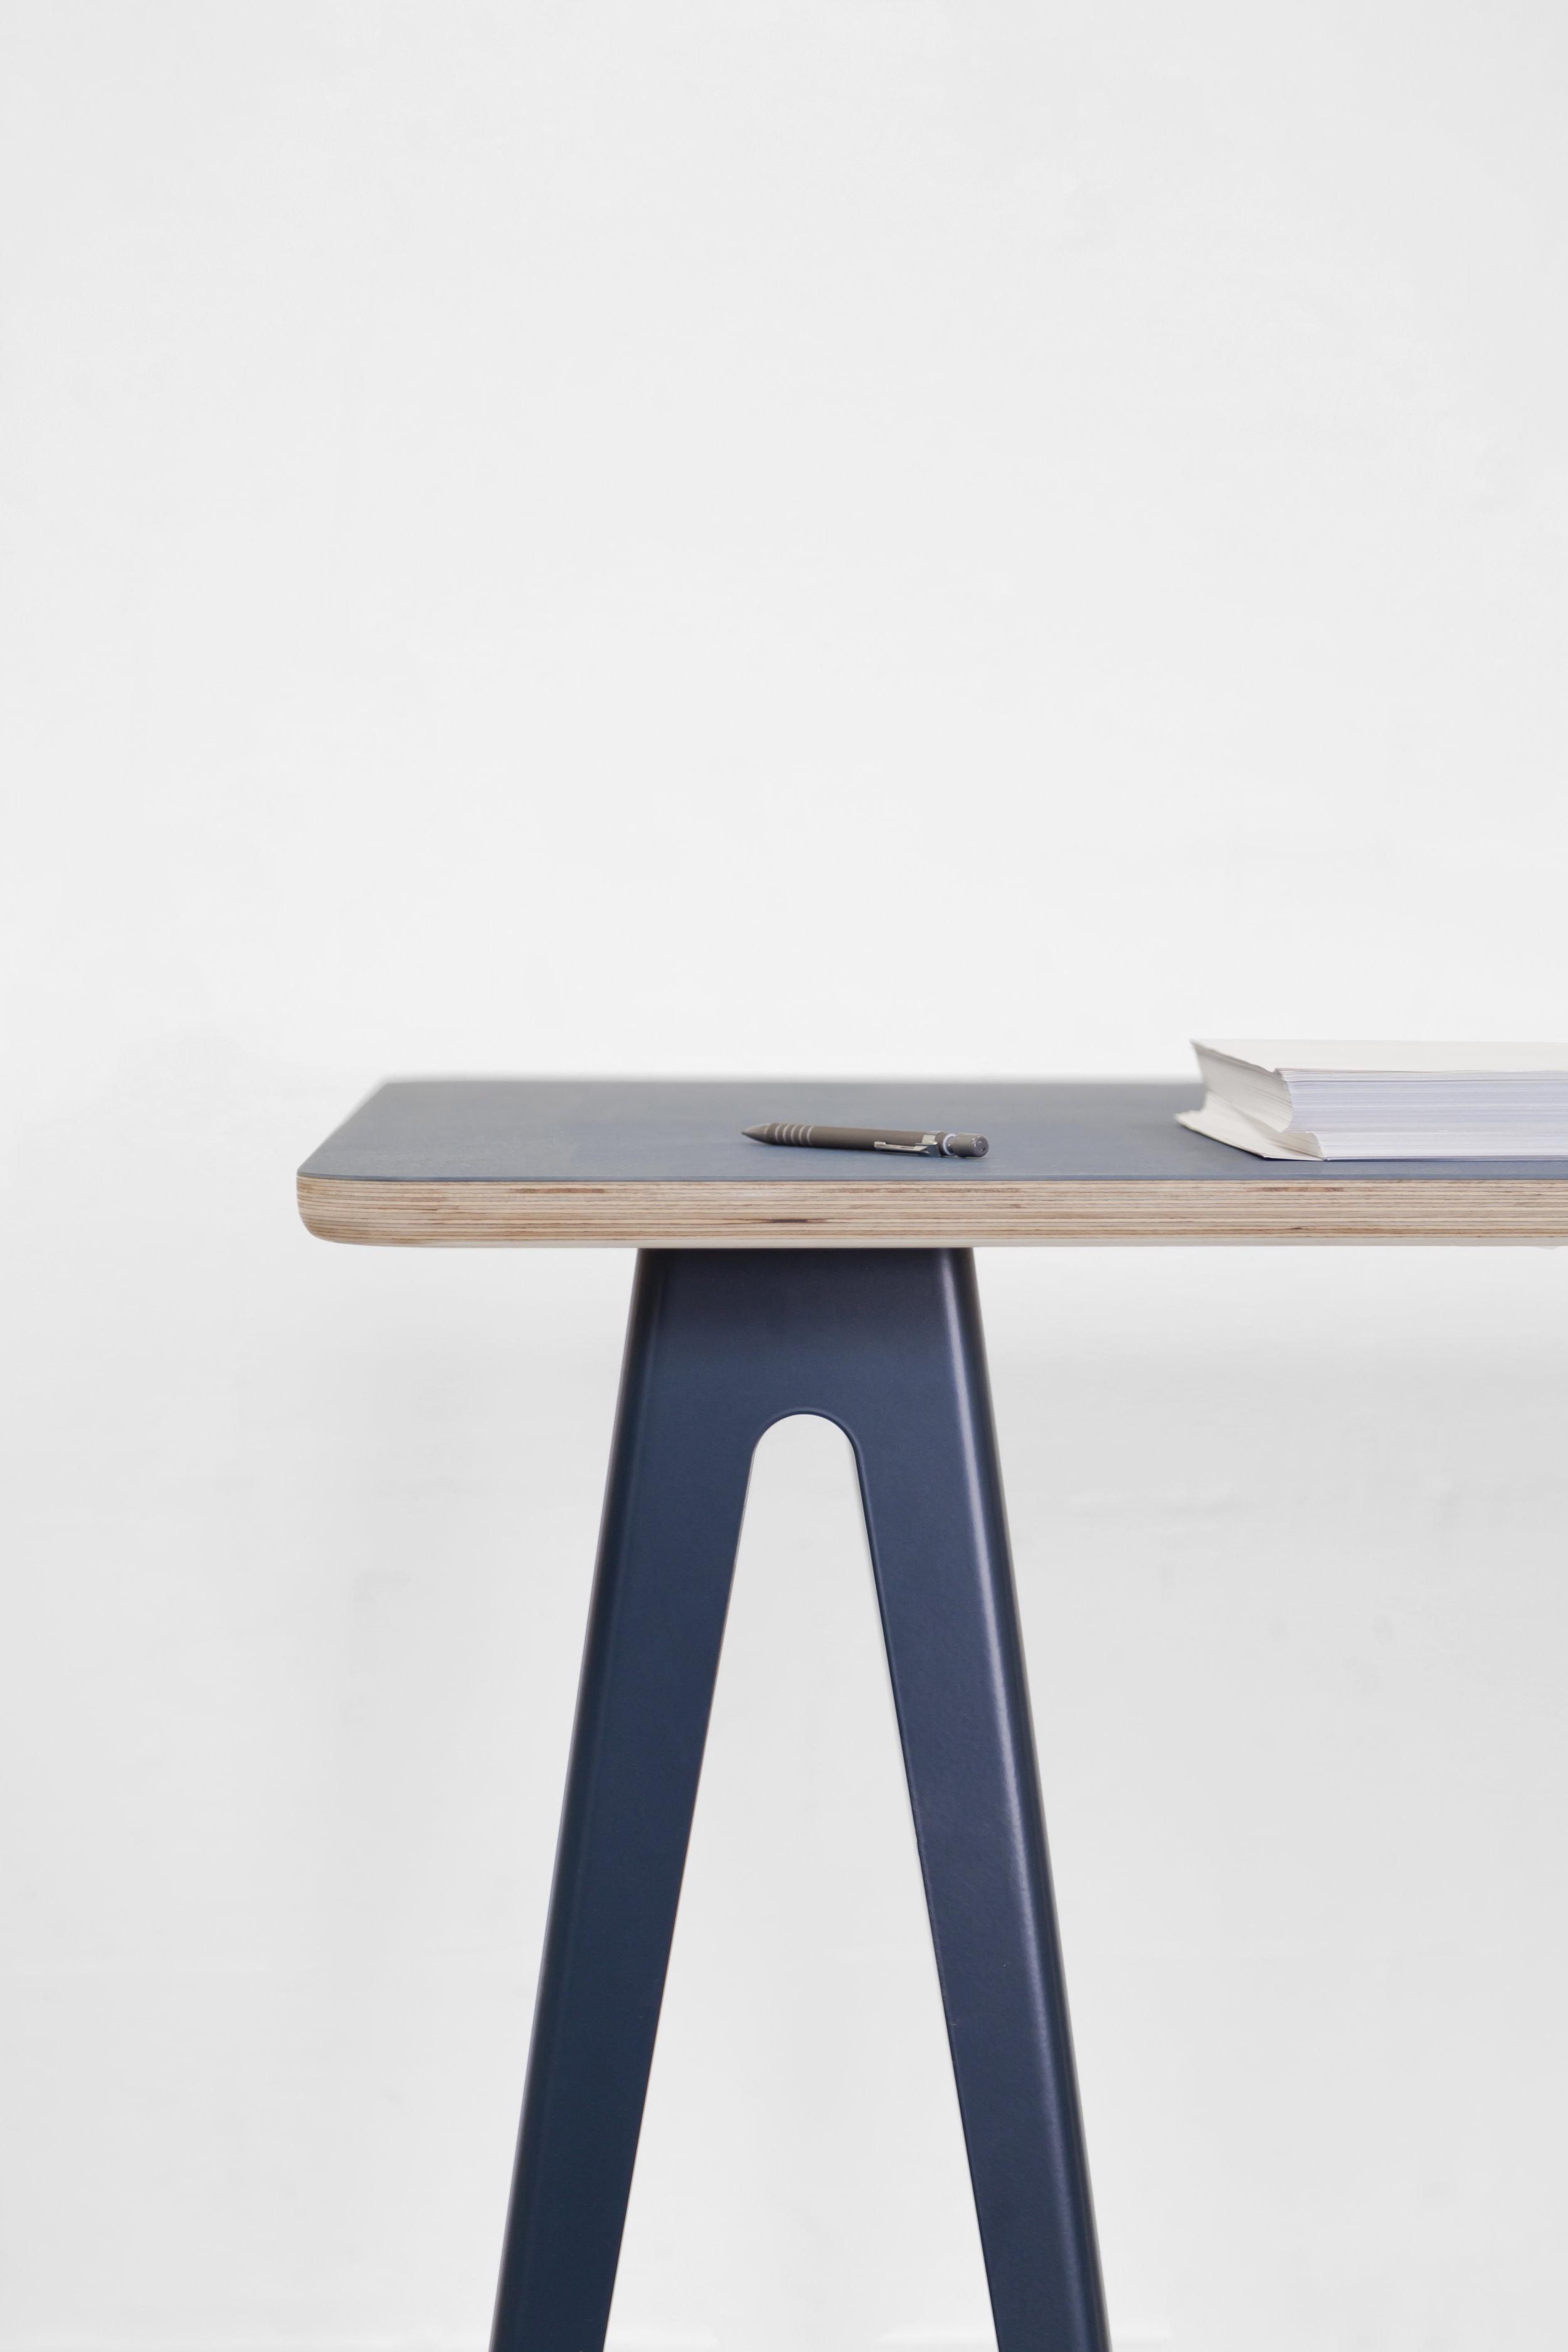 Vij5-Trestle-Table-by-David-Derksen-IMG_8394-2018-image-by-Vij5-.jpg